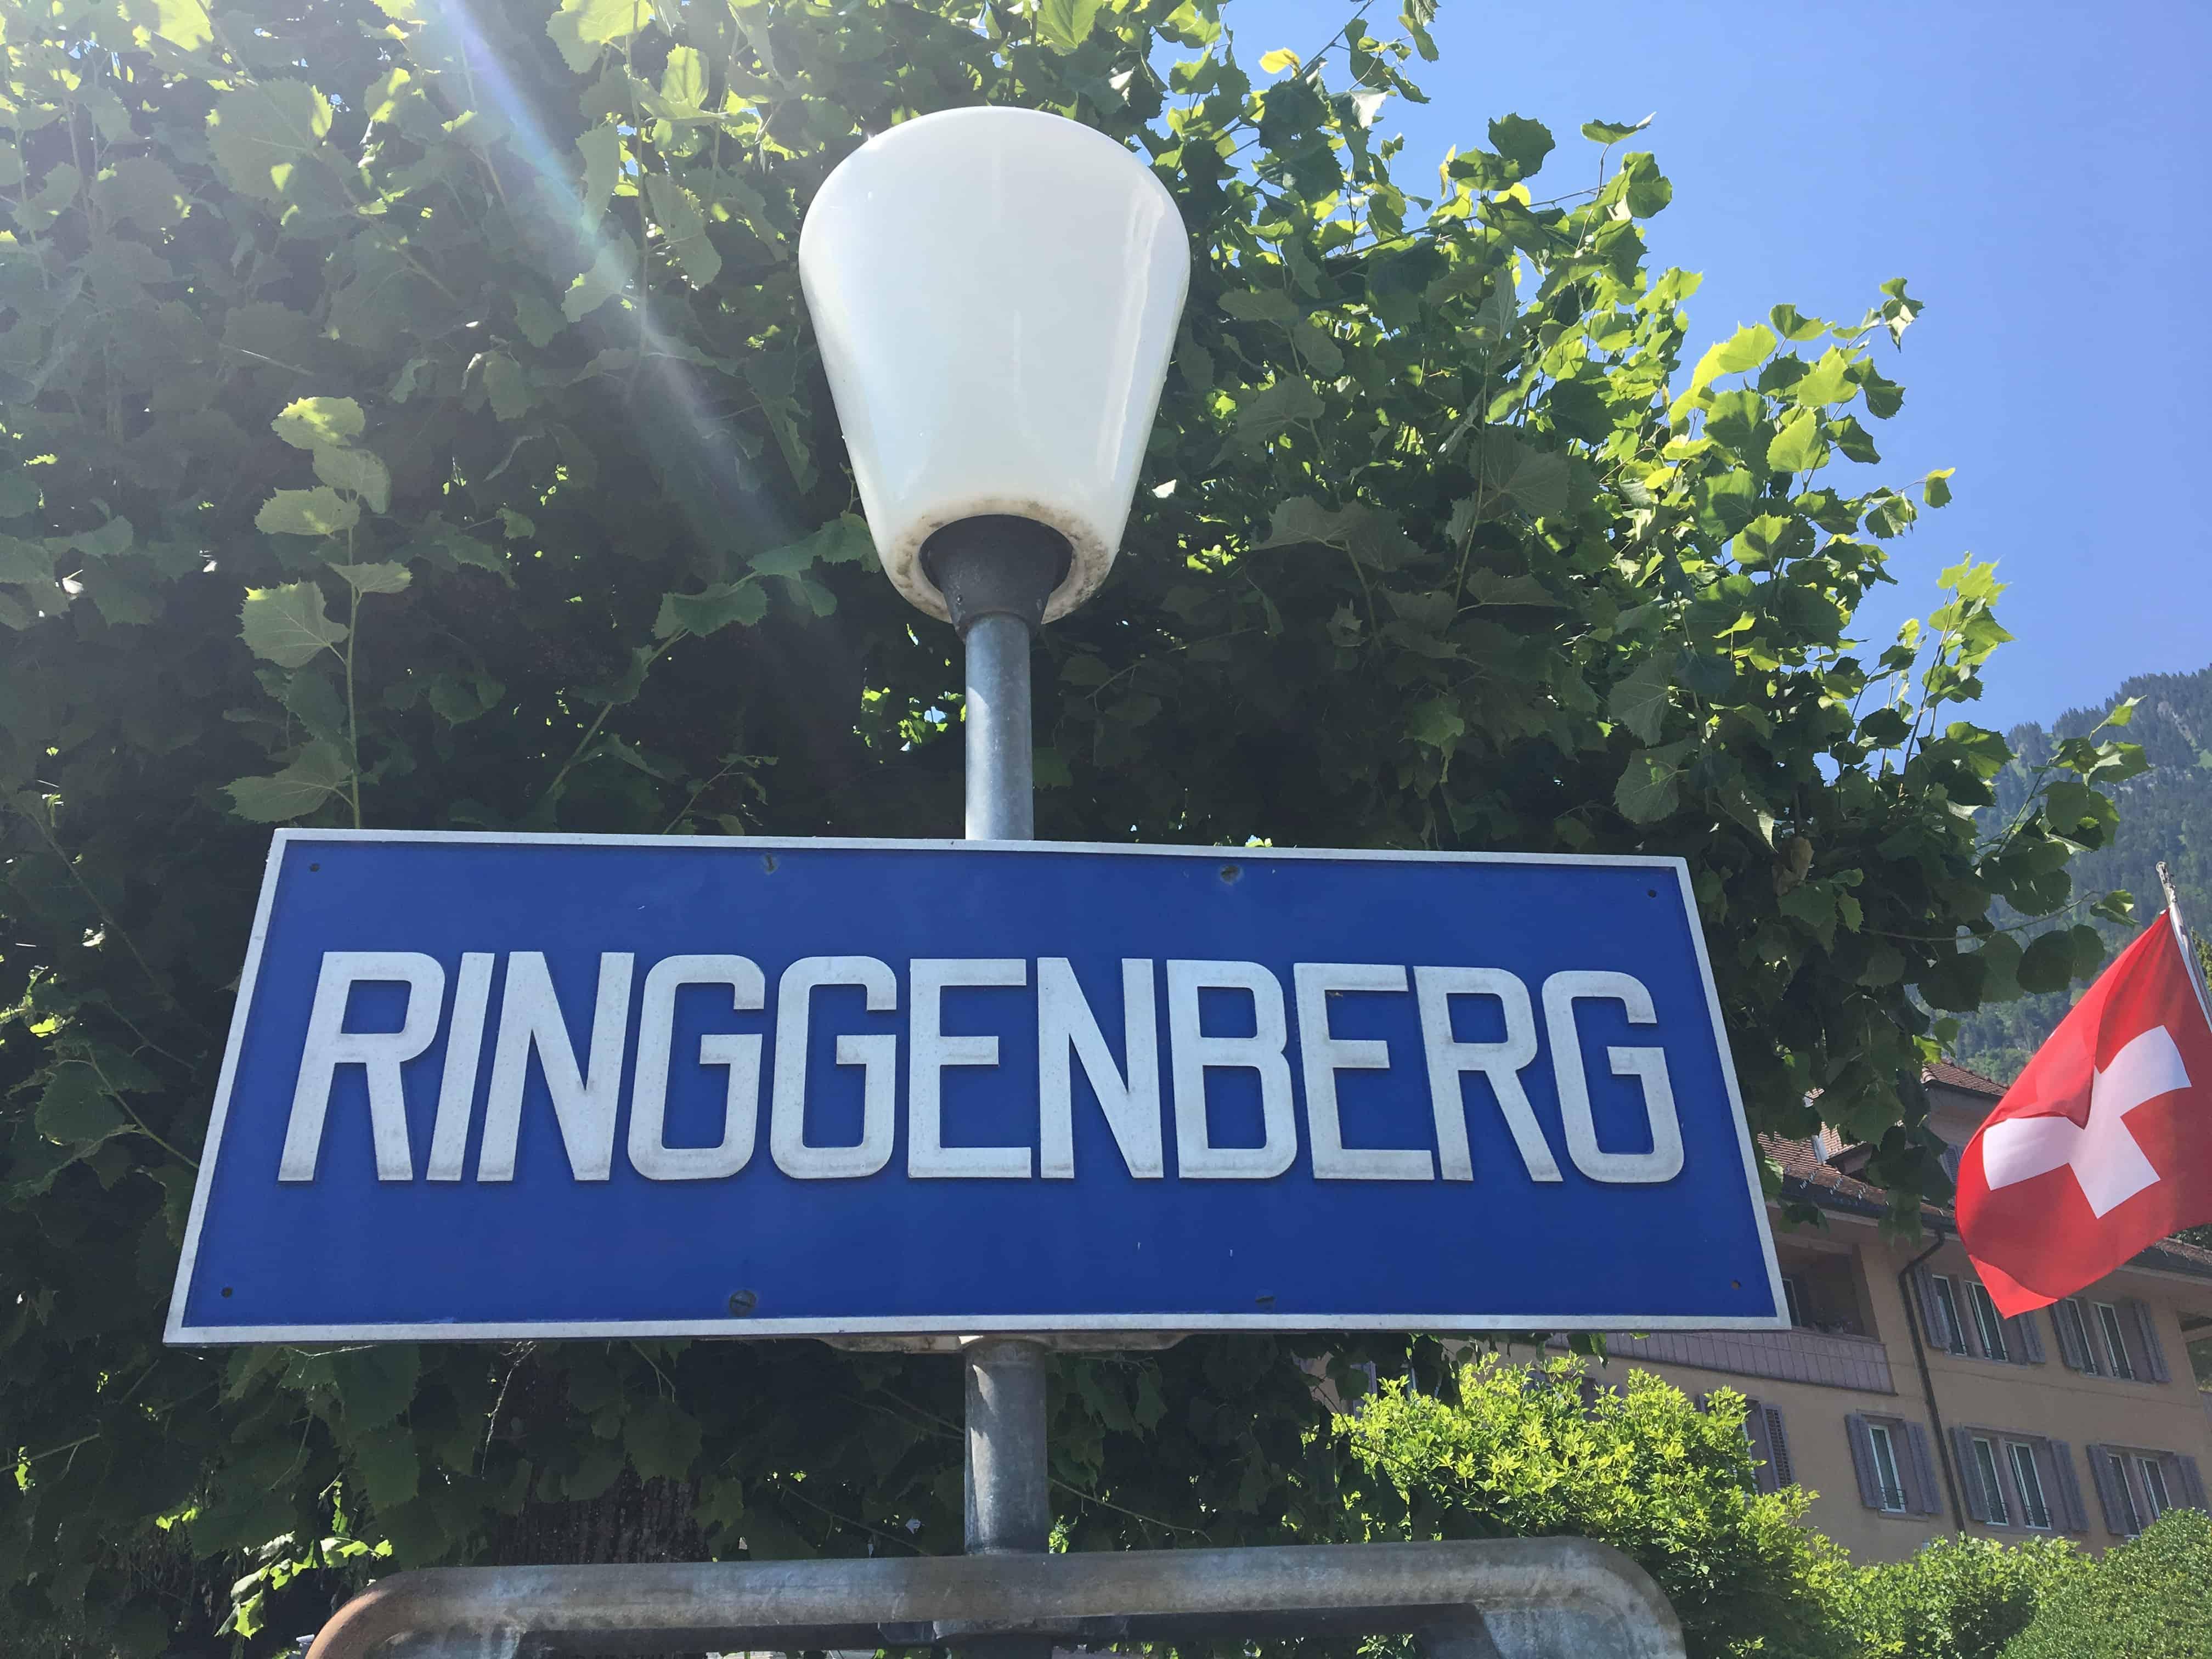 Ringgenberg Schiffsstation